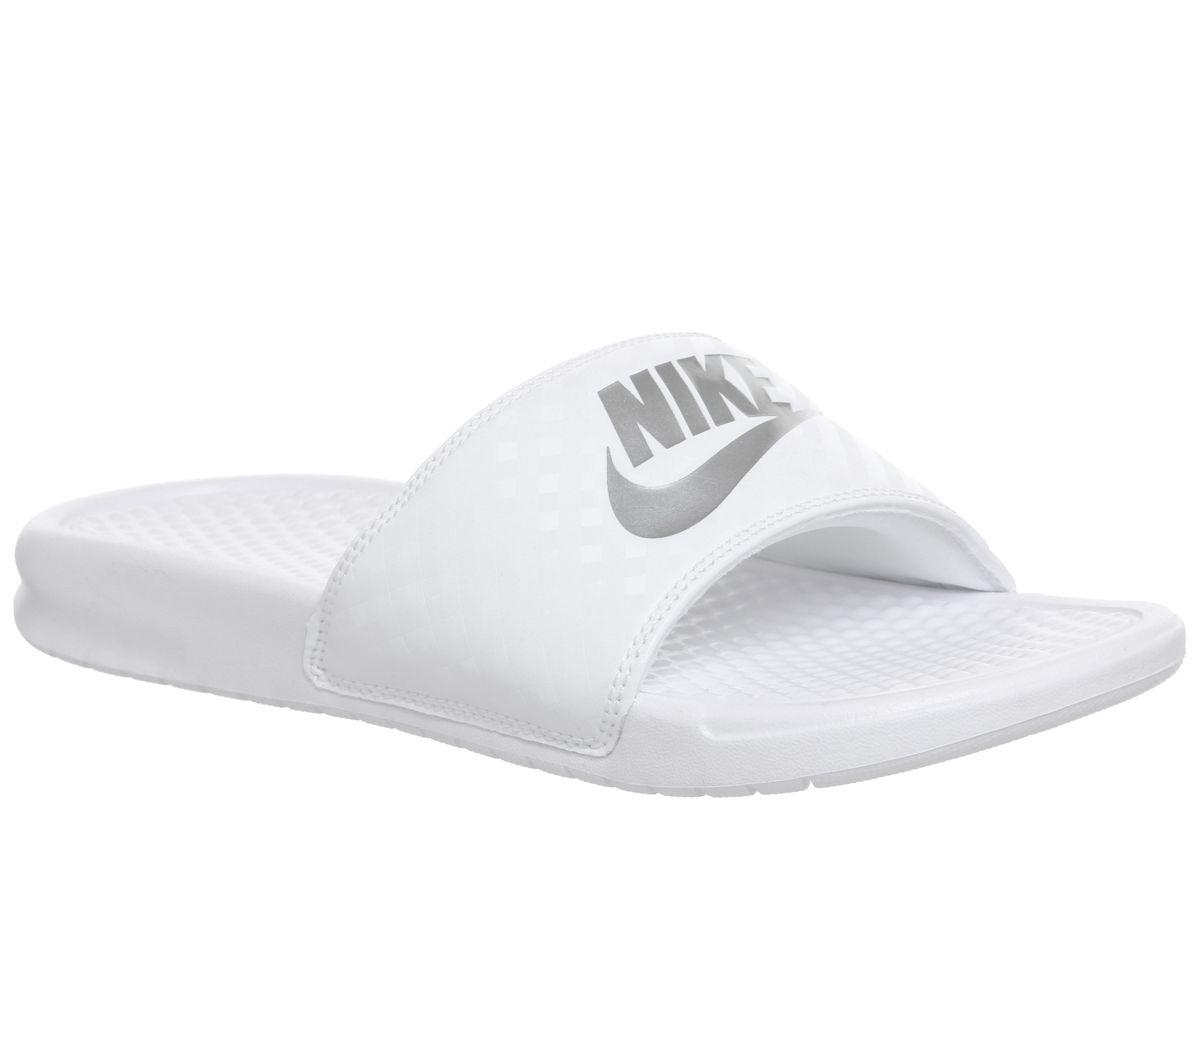 48a2dc4906f5 Nike Benassi Sliders White Silver - Sandals